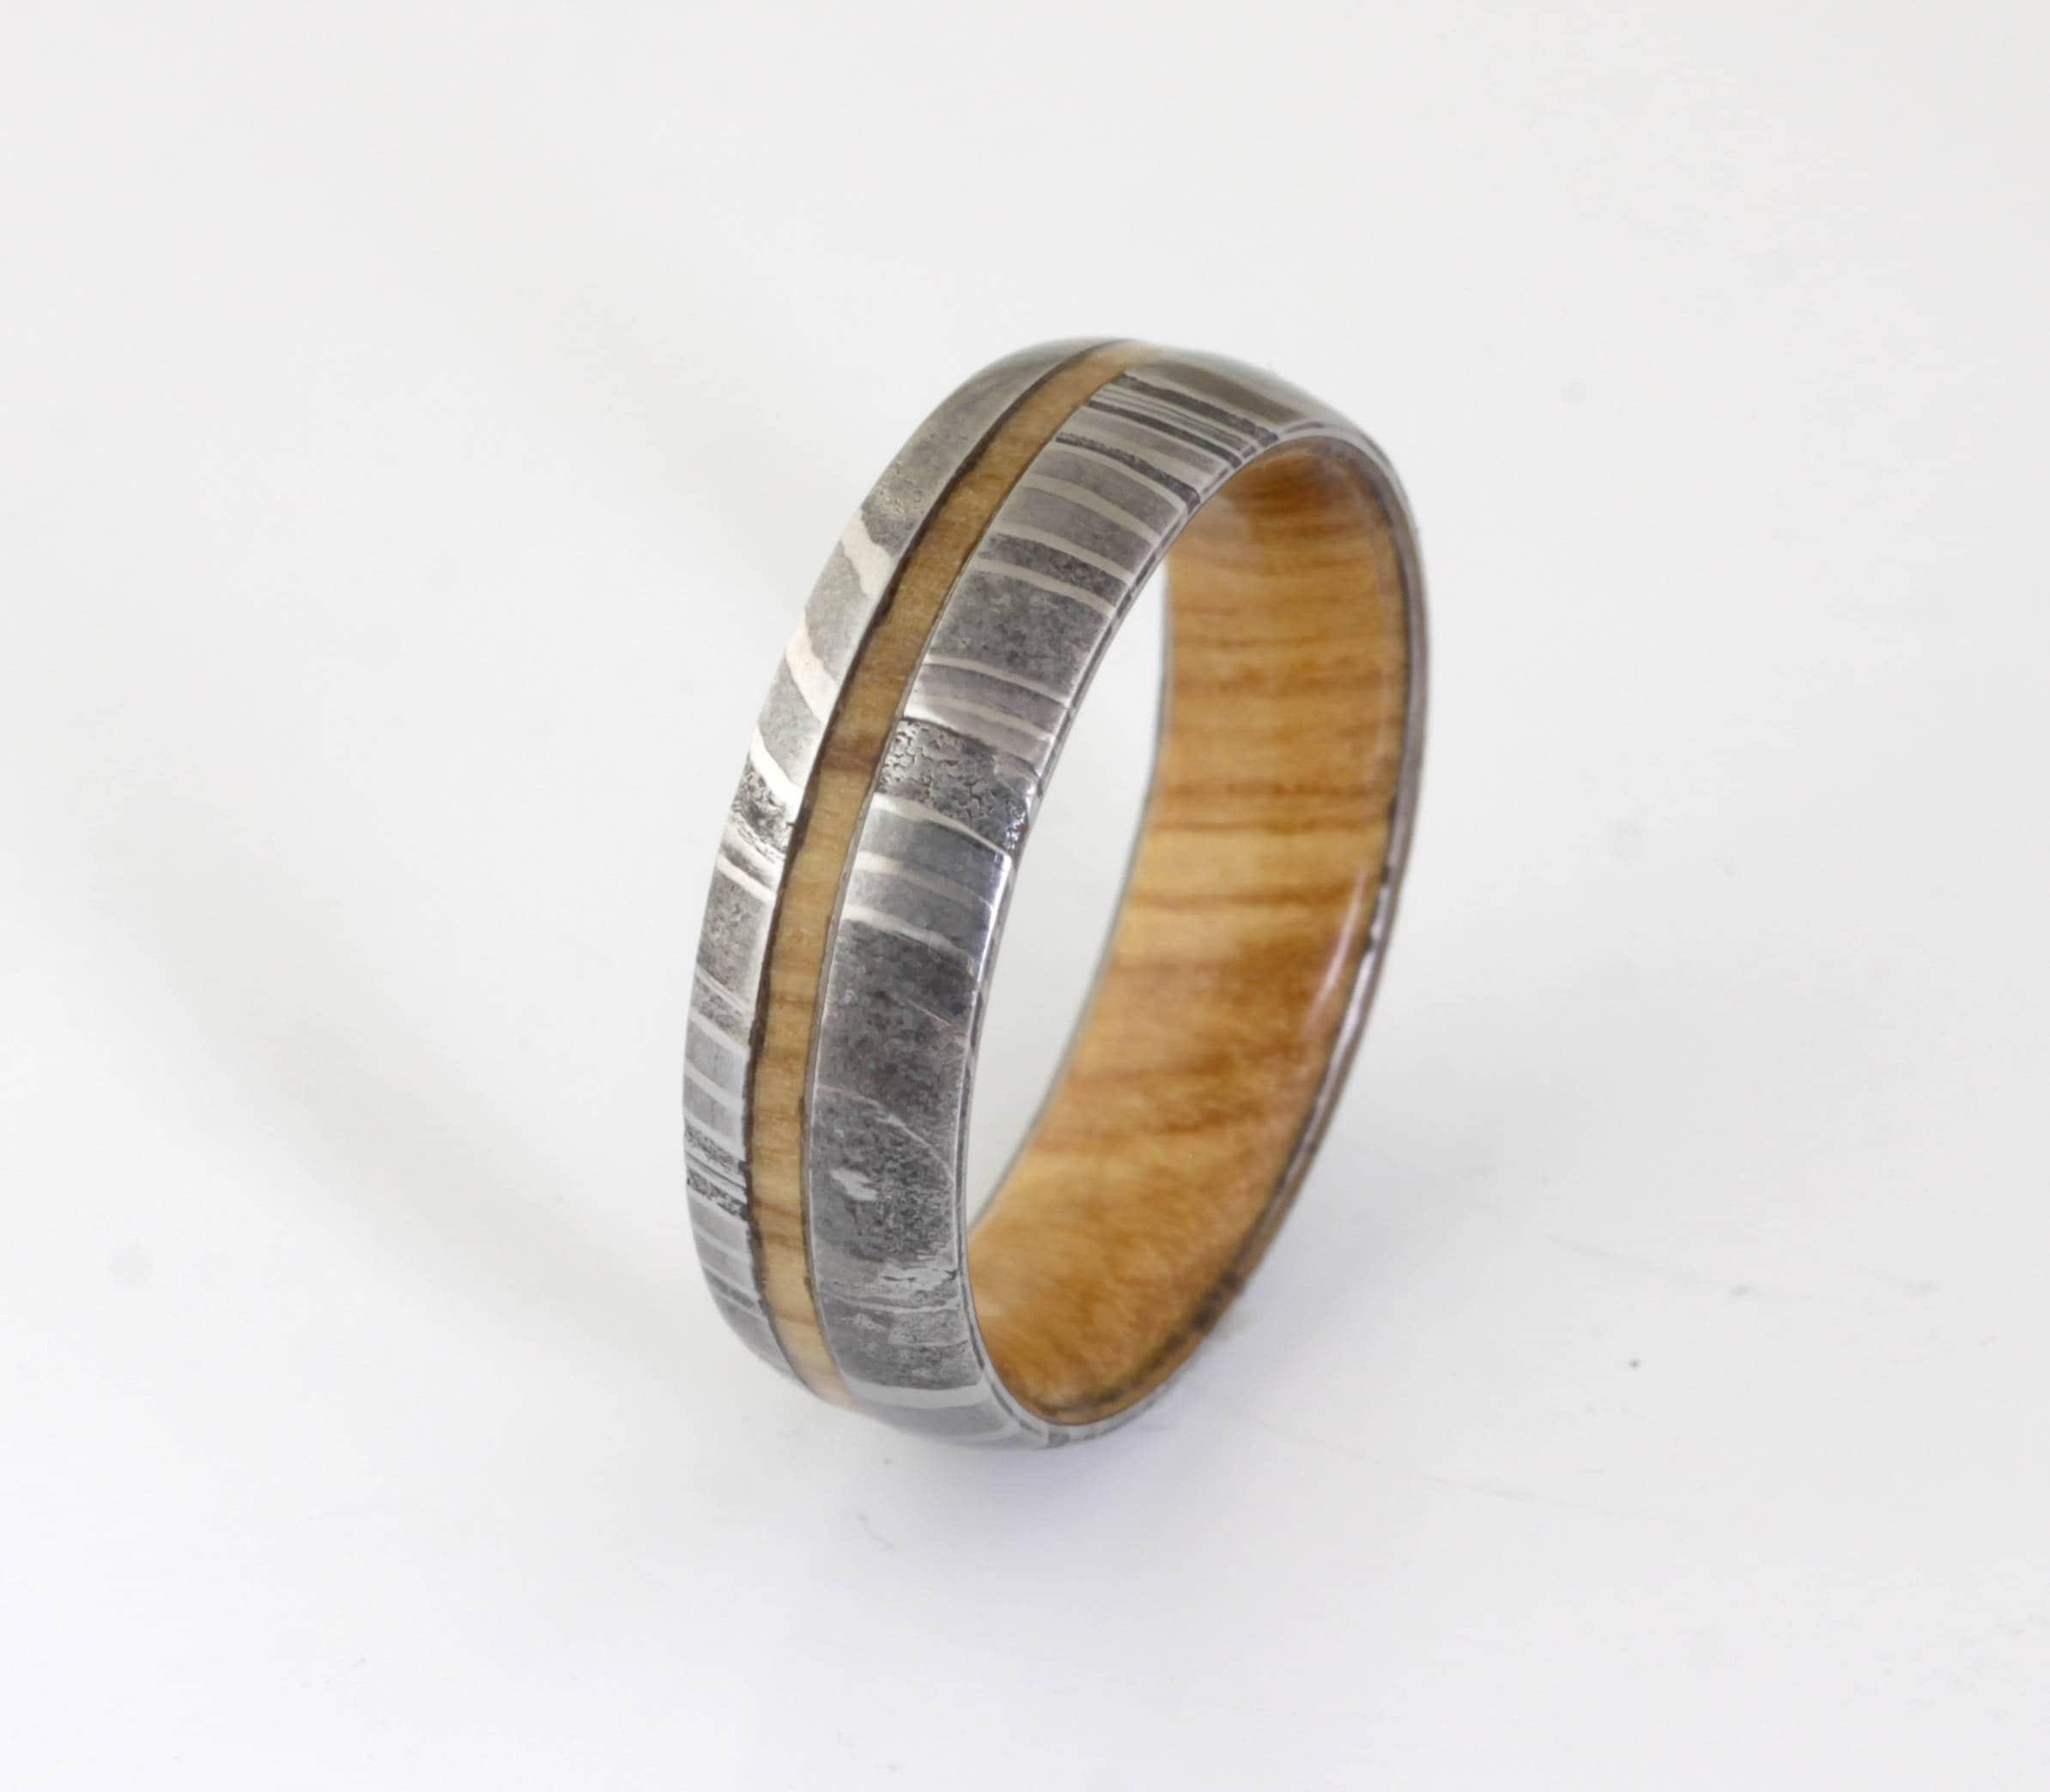 wood ring DAMASCUS steel ring wood wedding band man ring OLIVE